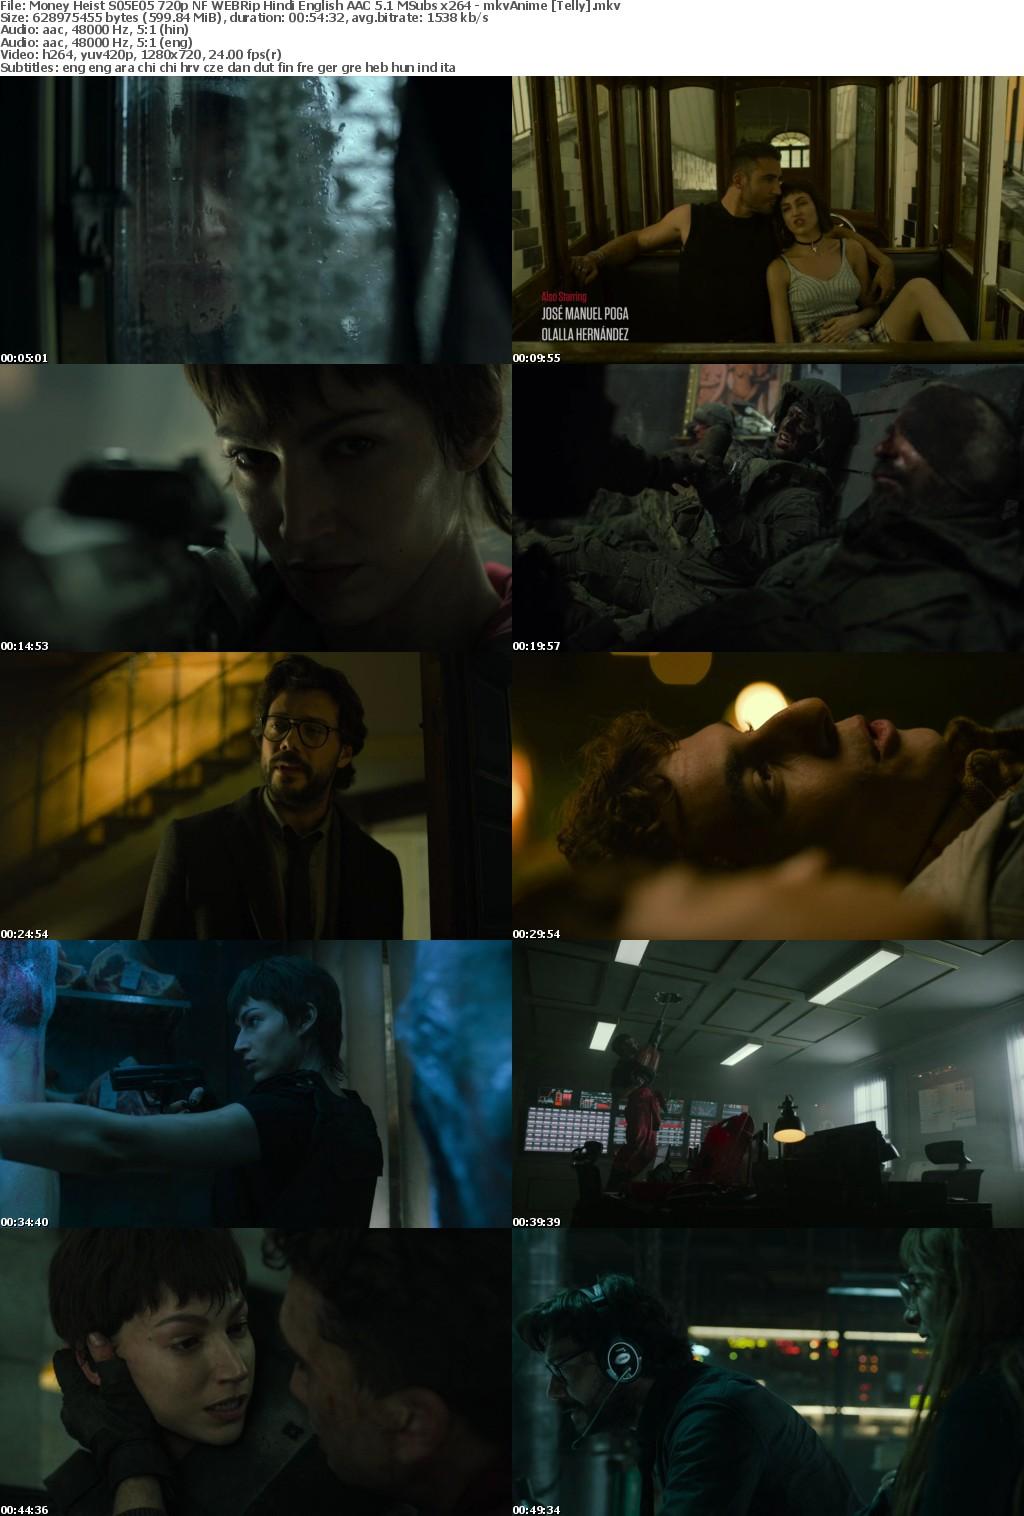 Money Heist S05 720p NF WEBRip Hindi English AAC 5 1 MSubs x264 - mkvAnime Telly